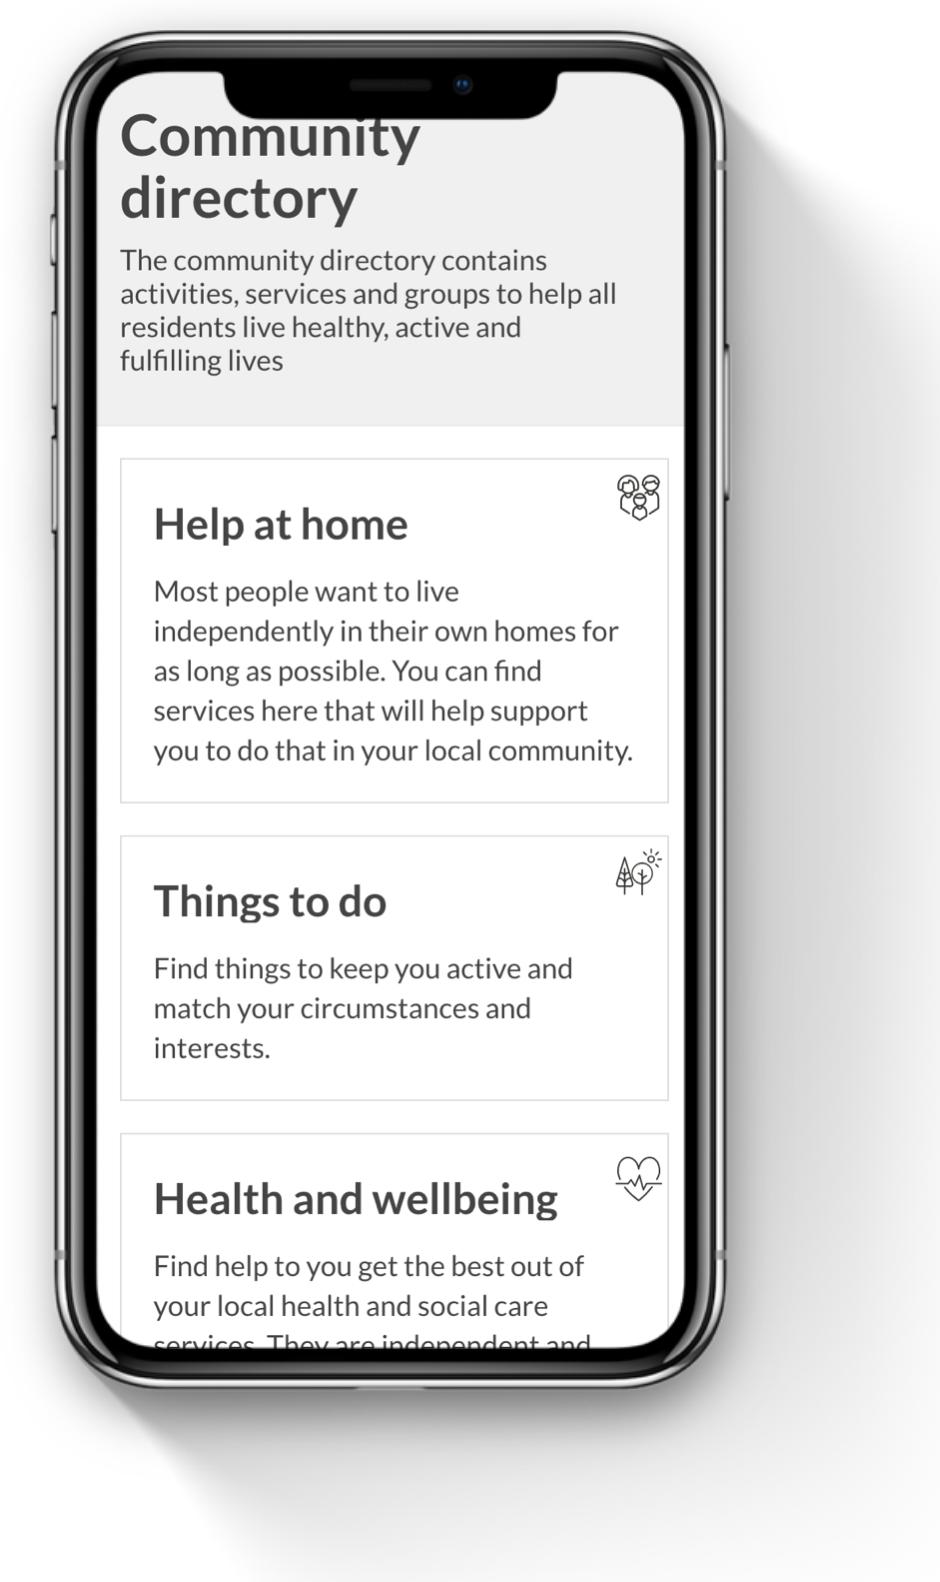 IEG4 community directory